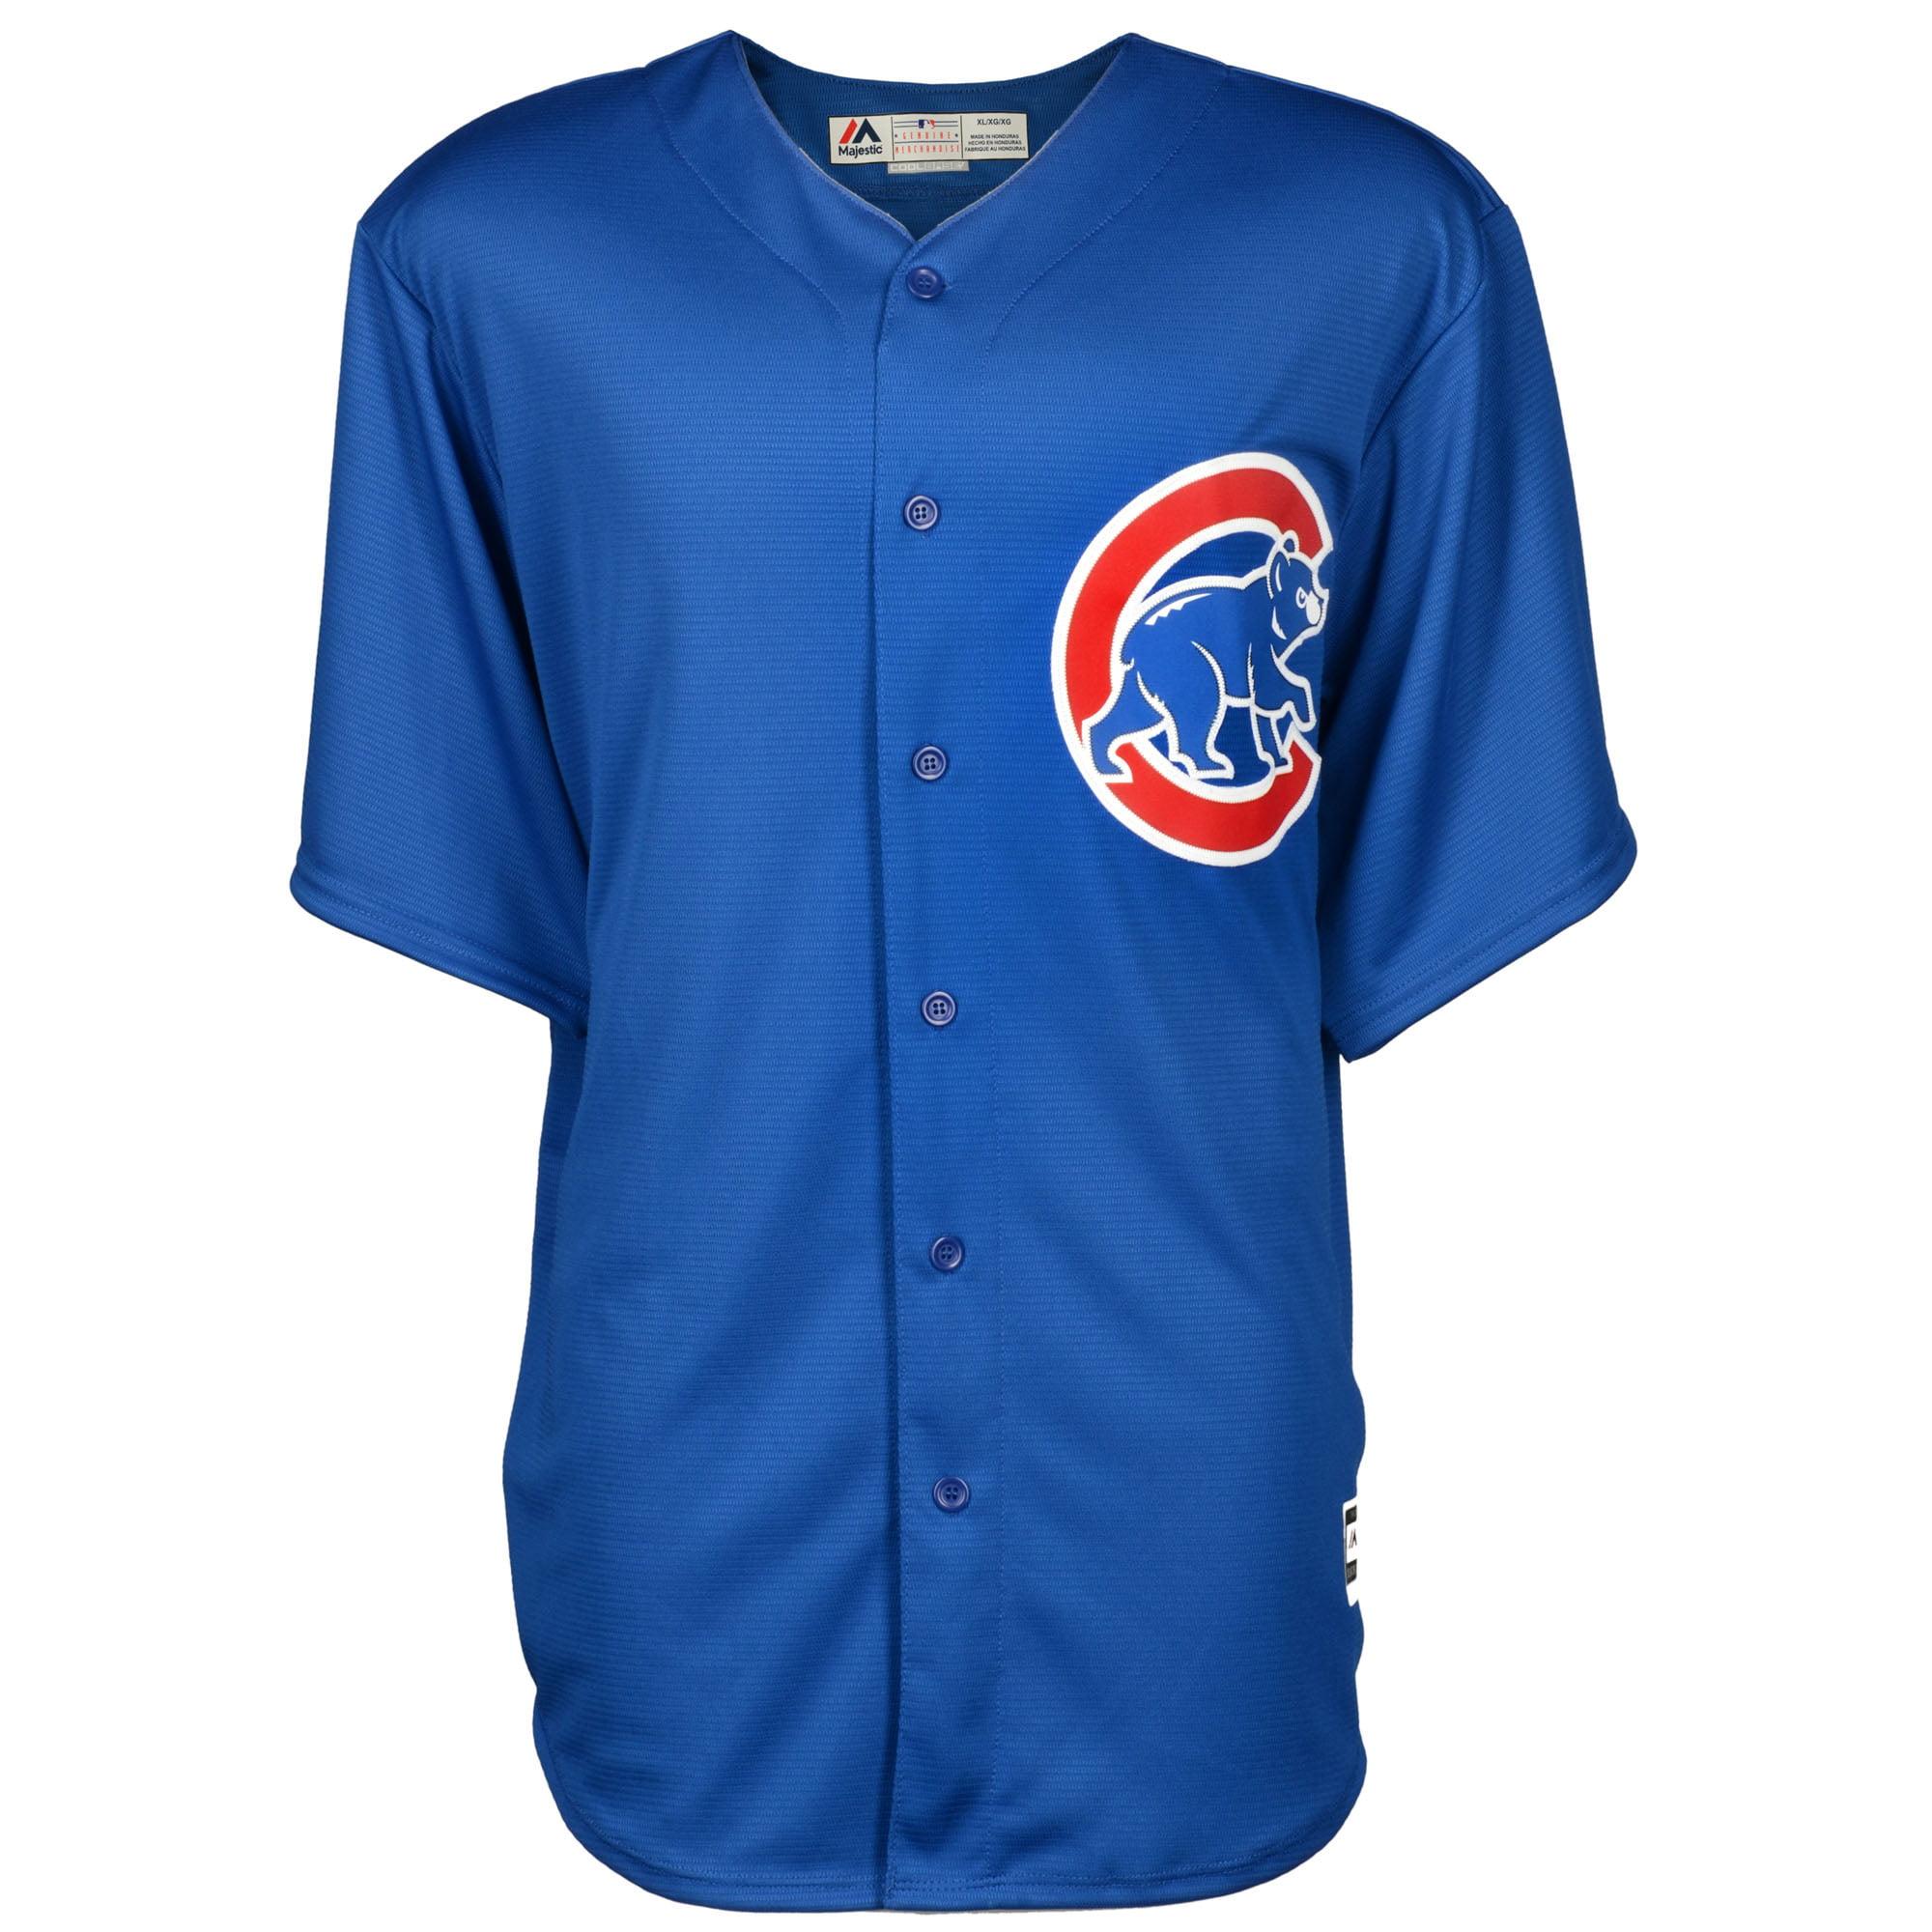 Kris Bryant Chicago Cubs Autographed Blue Replica Jersey - Fanatics  Authentic Certified - Walmart.com 21958471a